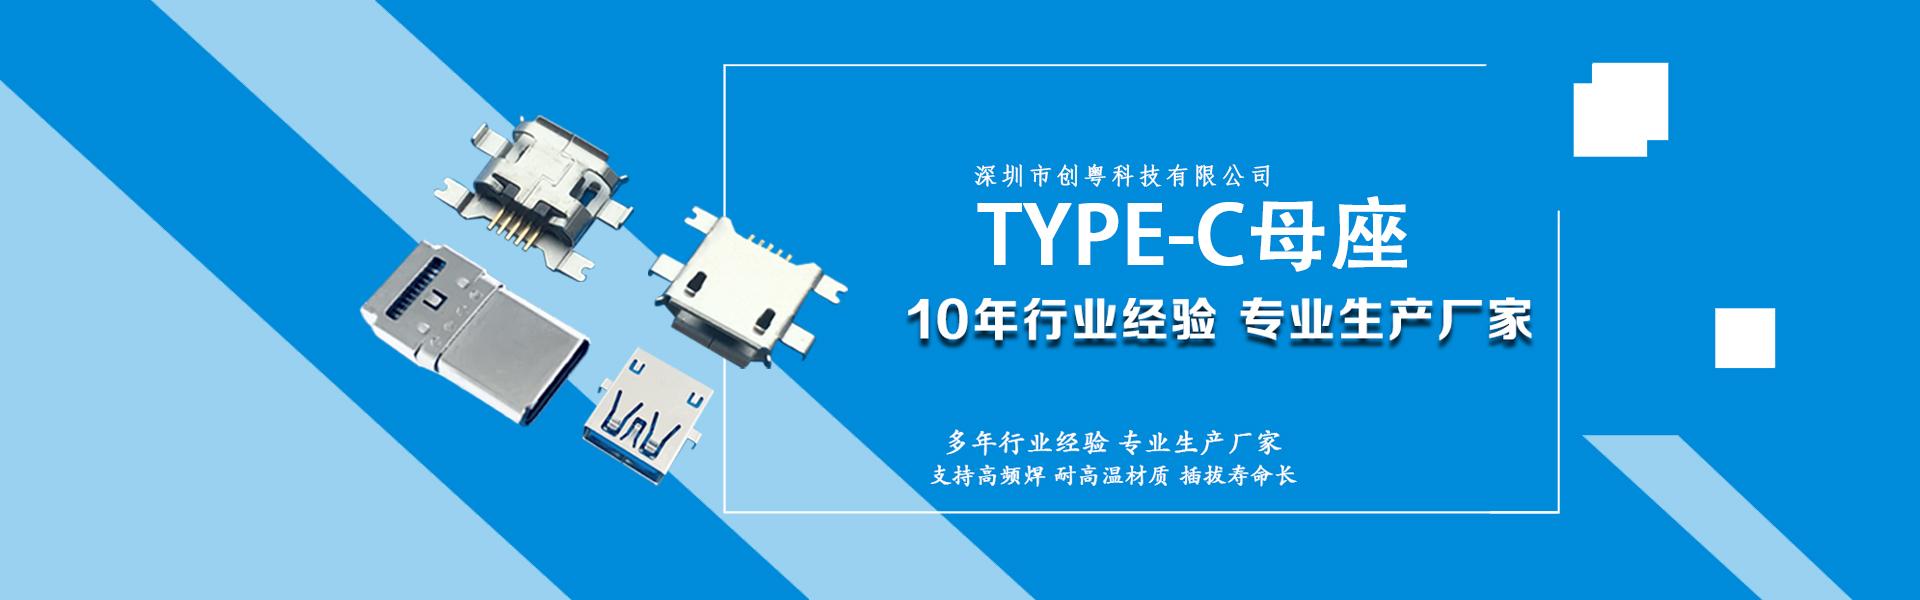 type-c母座